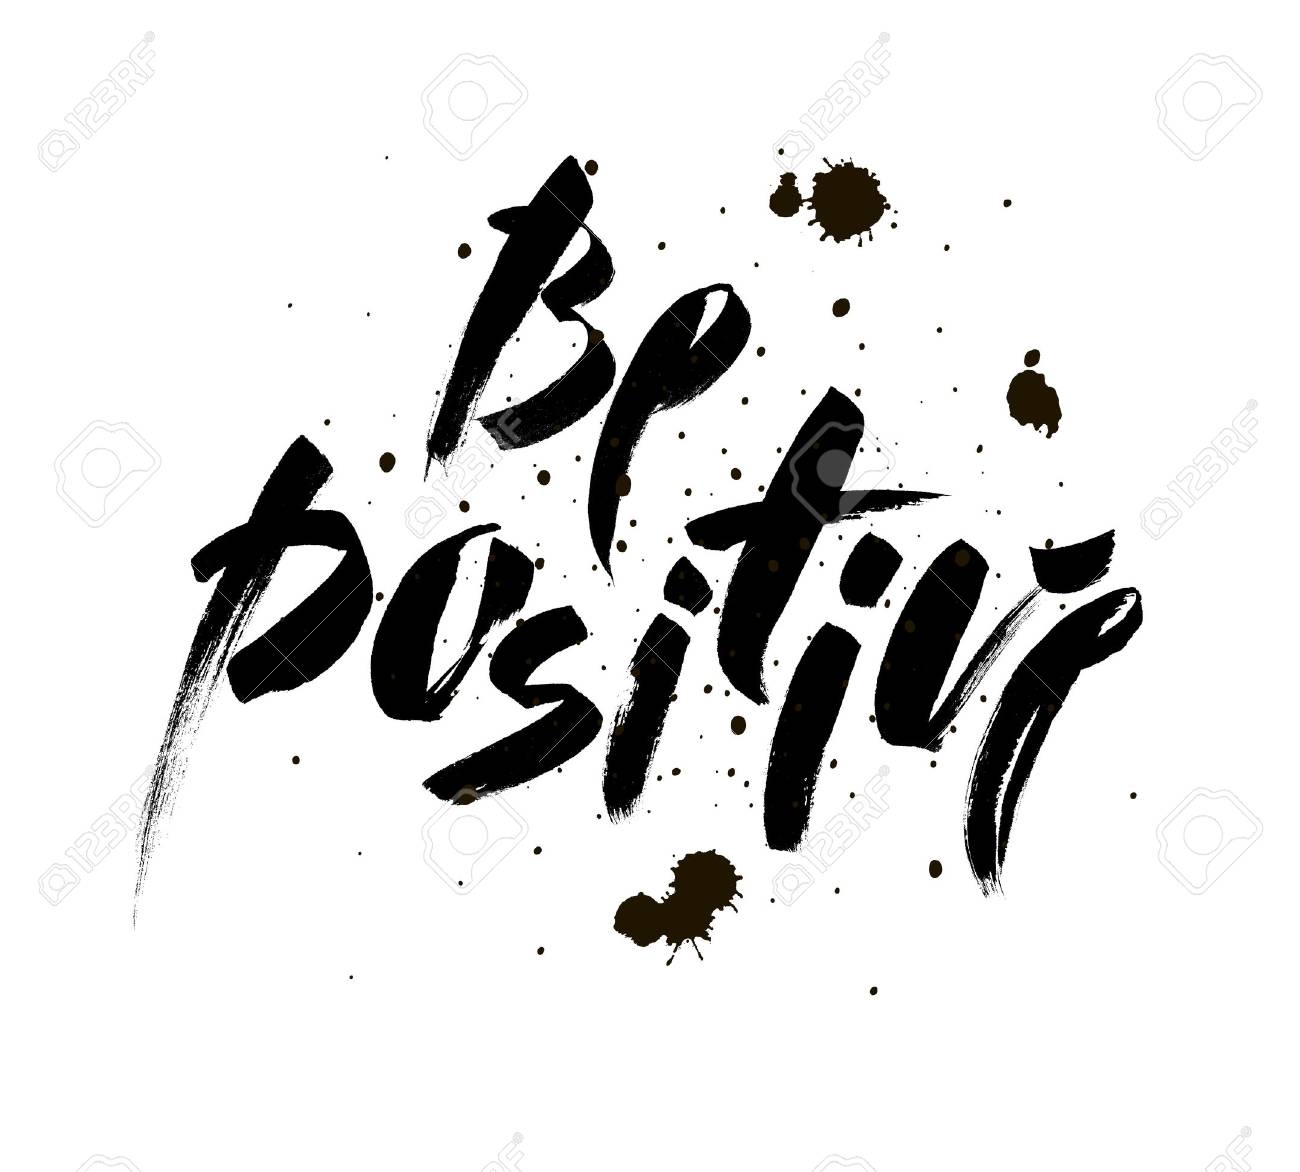 Ser Positivo Inspiracional Sobre Feliz Frase De Caligrafia